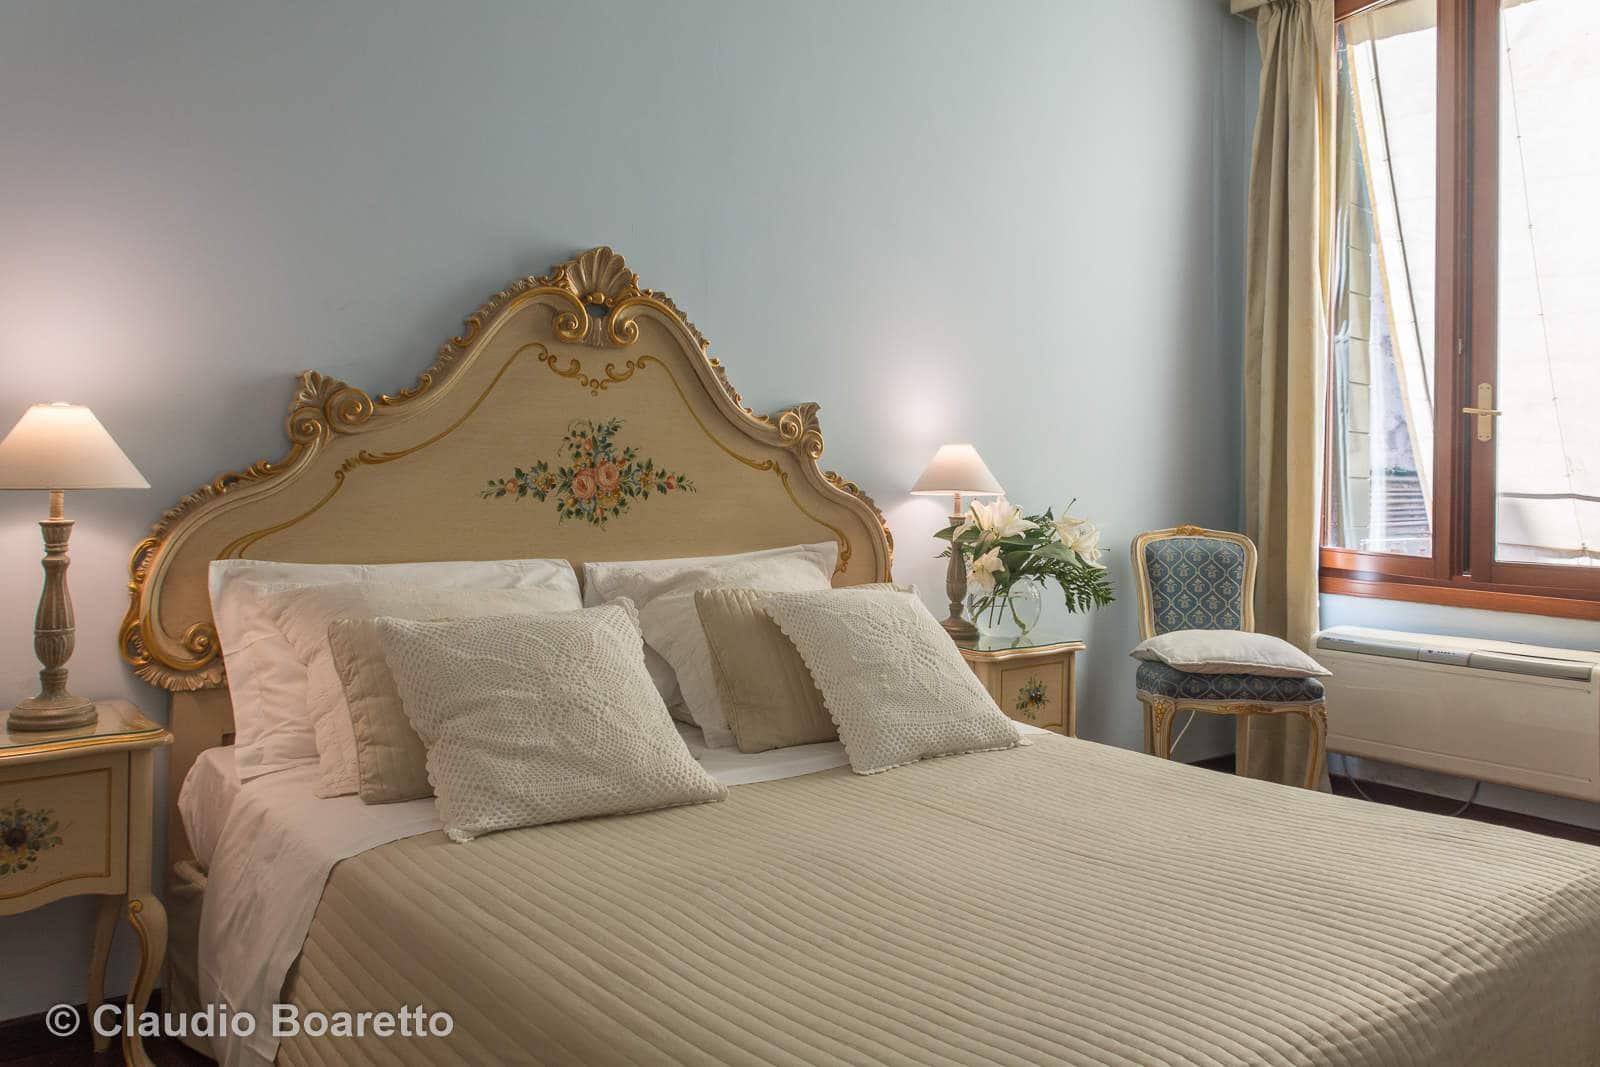 Residenza Al Pozzo Chambres D Hotes Avec Salle De Bain Privee